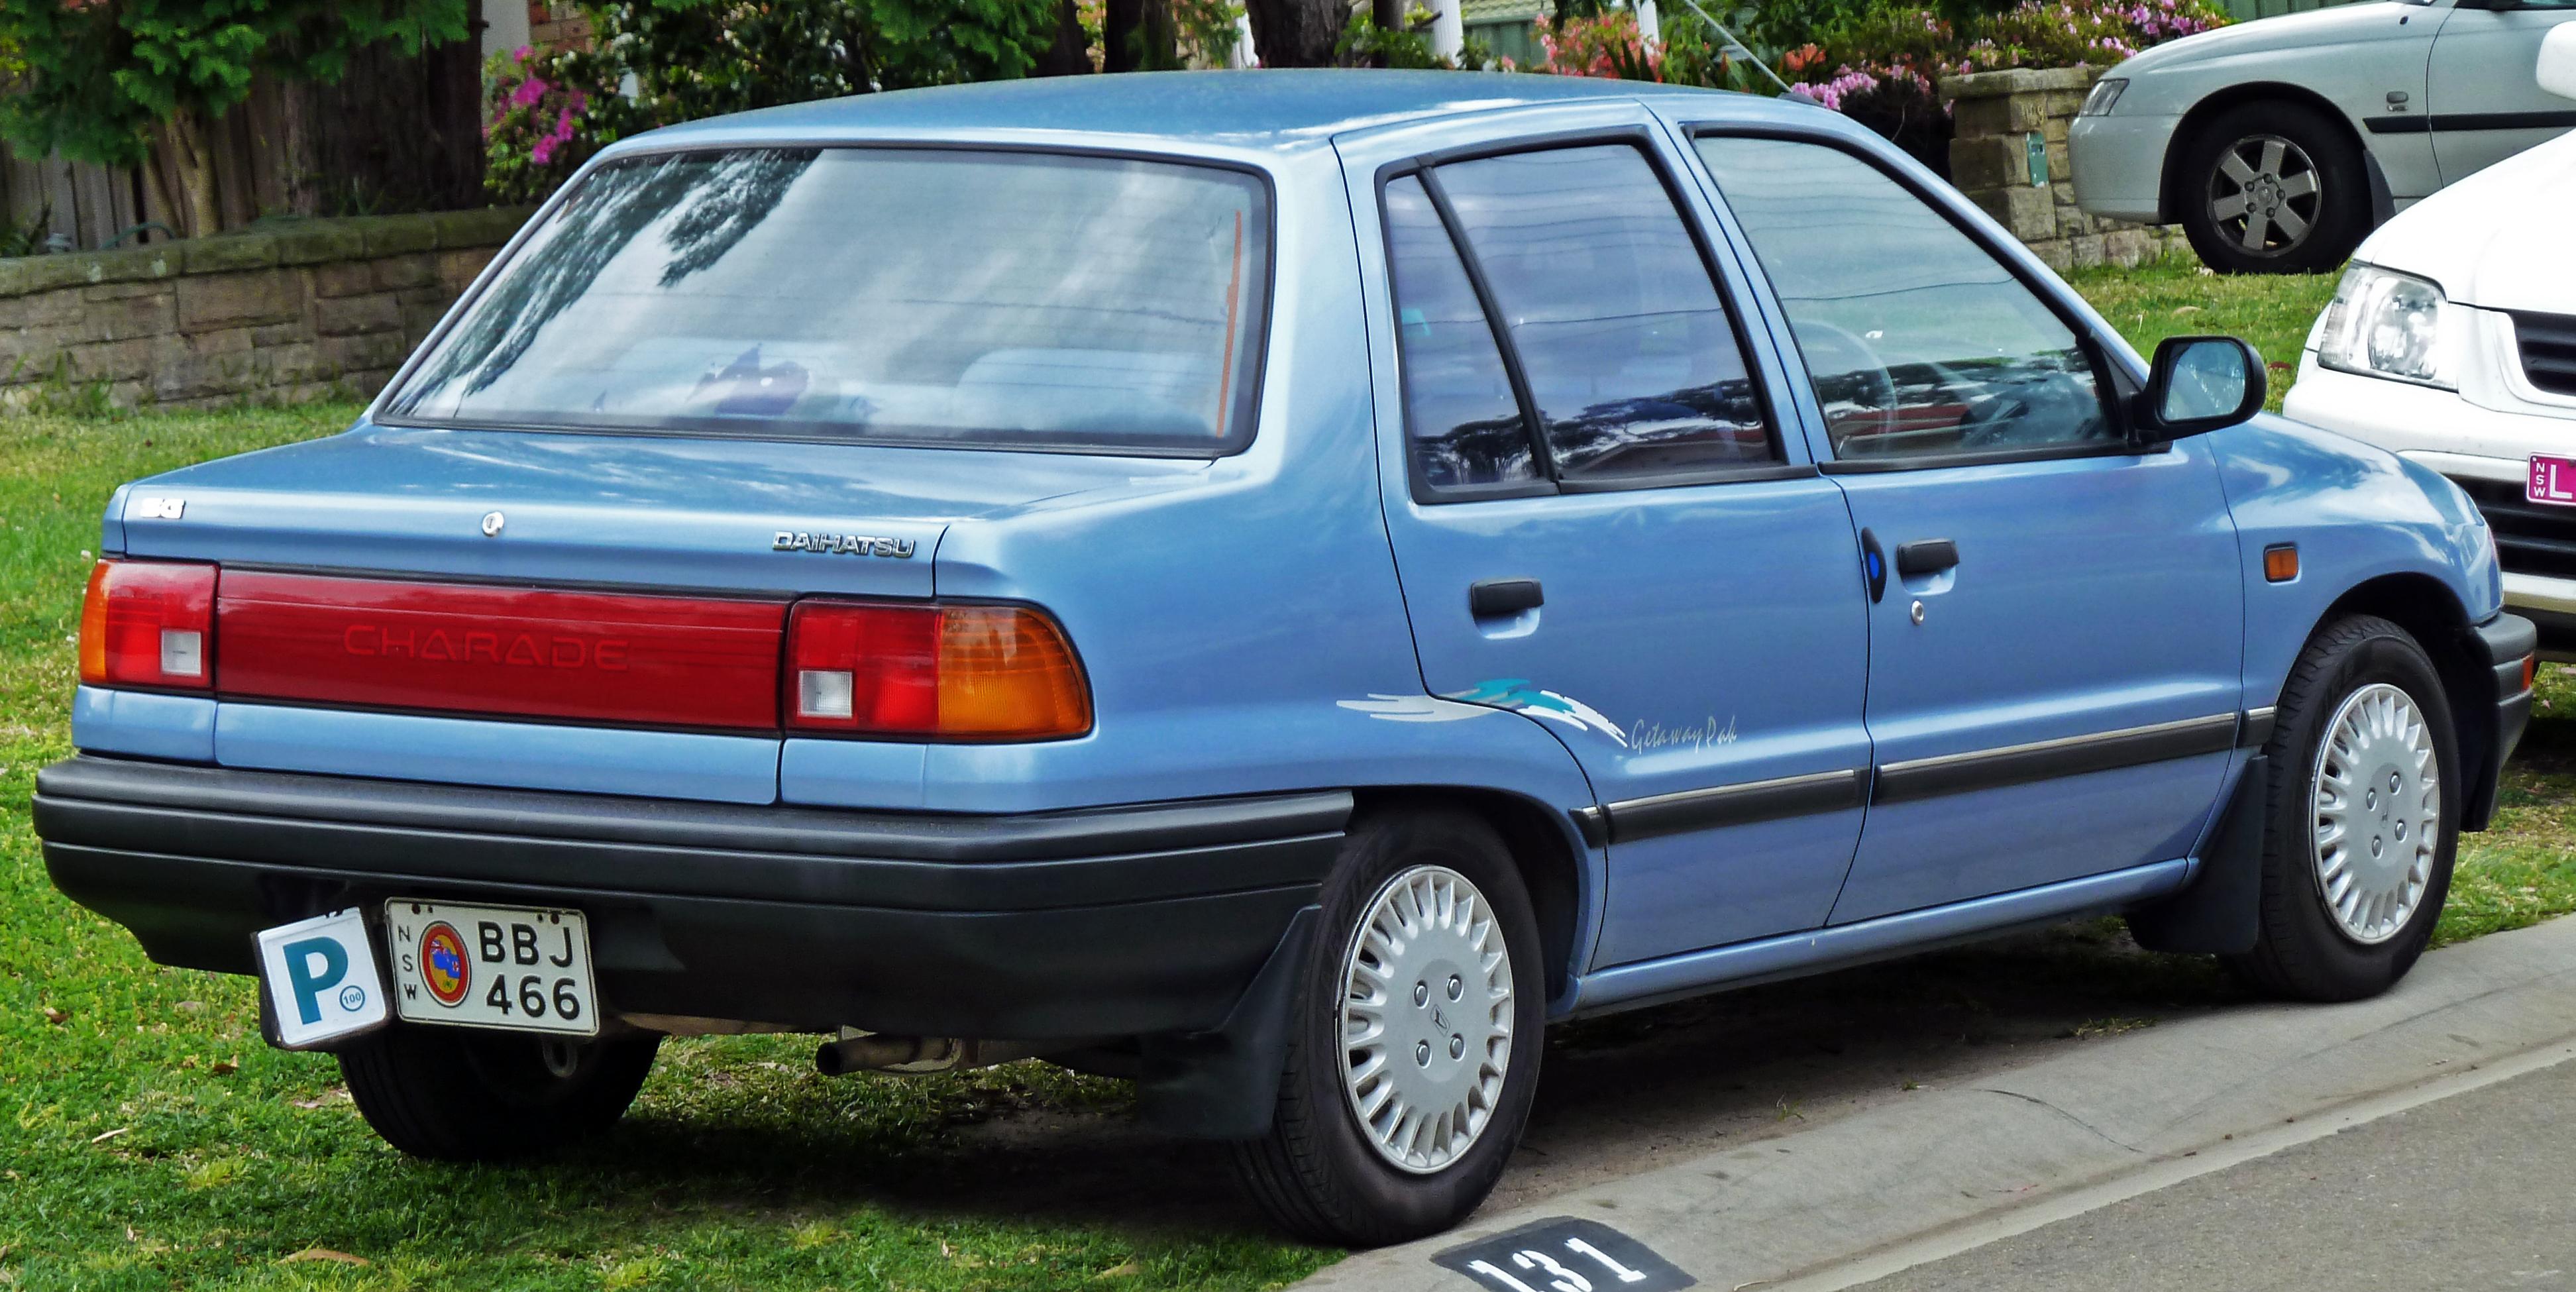 1994 Daihatsu Charade - Partsopen